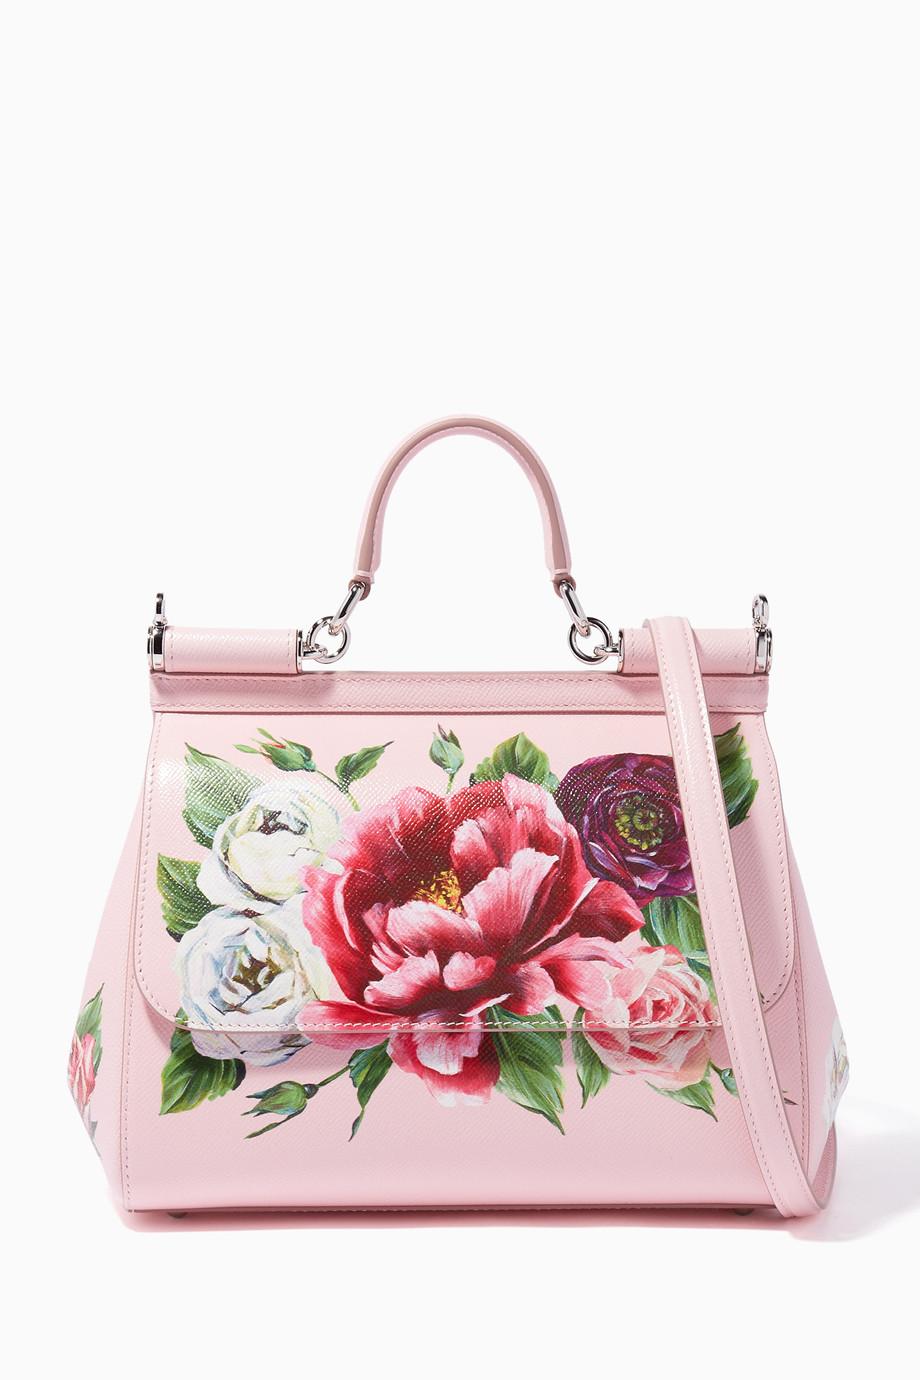 8190f1db63ccd Shop Dolce & Gabbana Pink Light-Pink Medium Peony Miss Sicily Bag ...